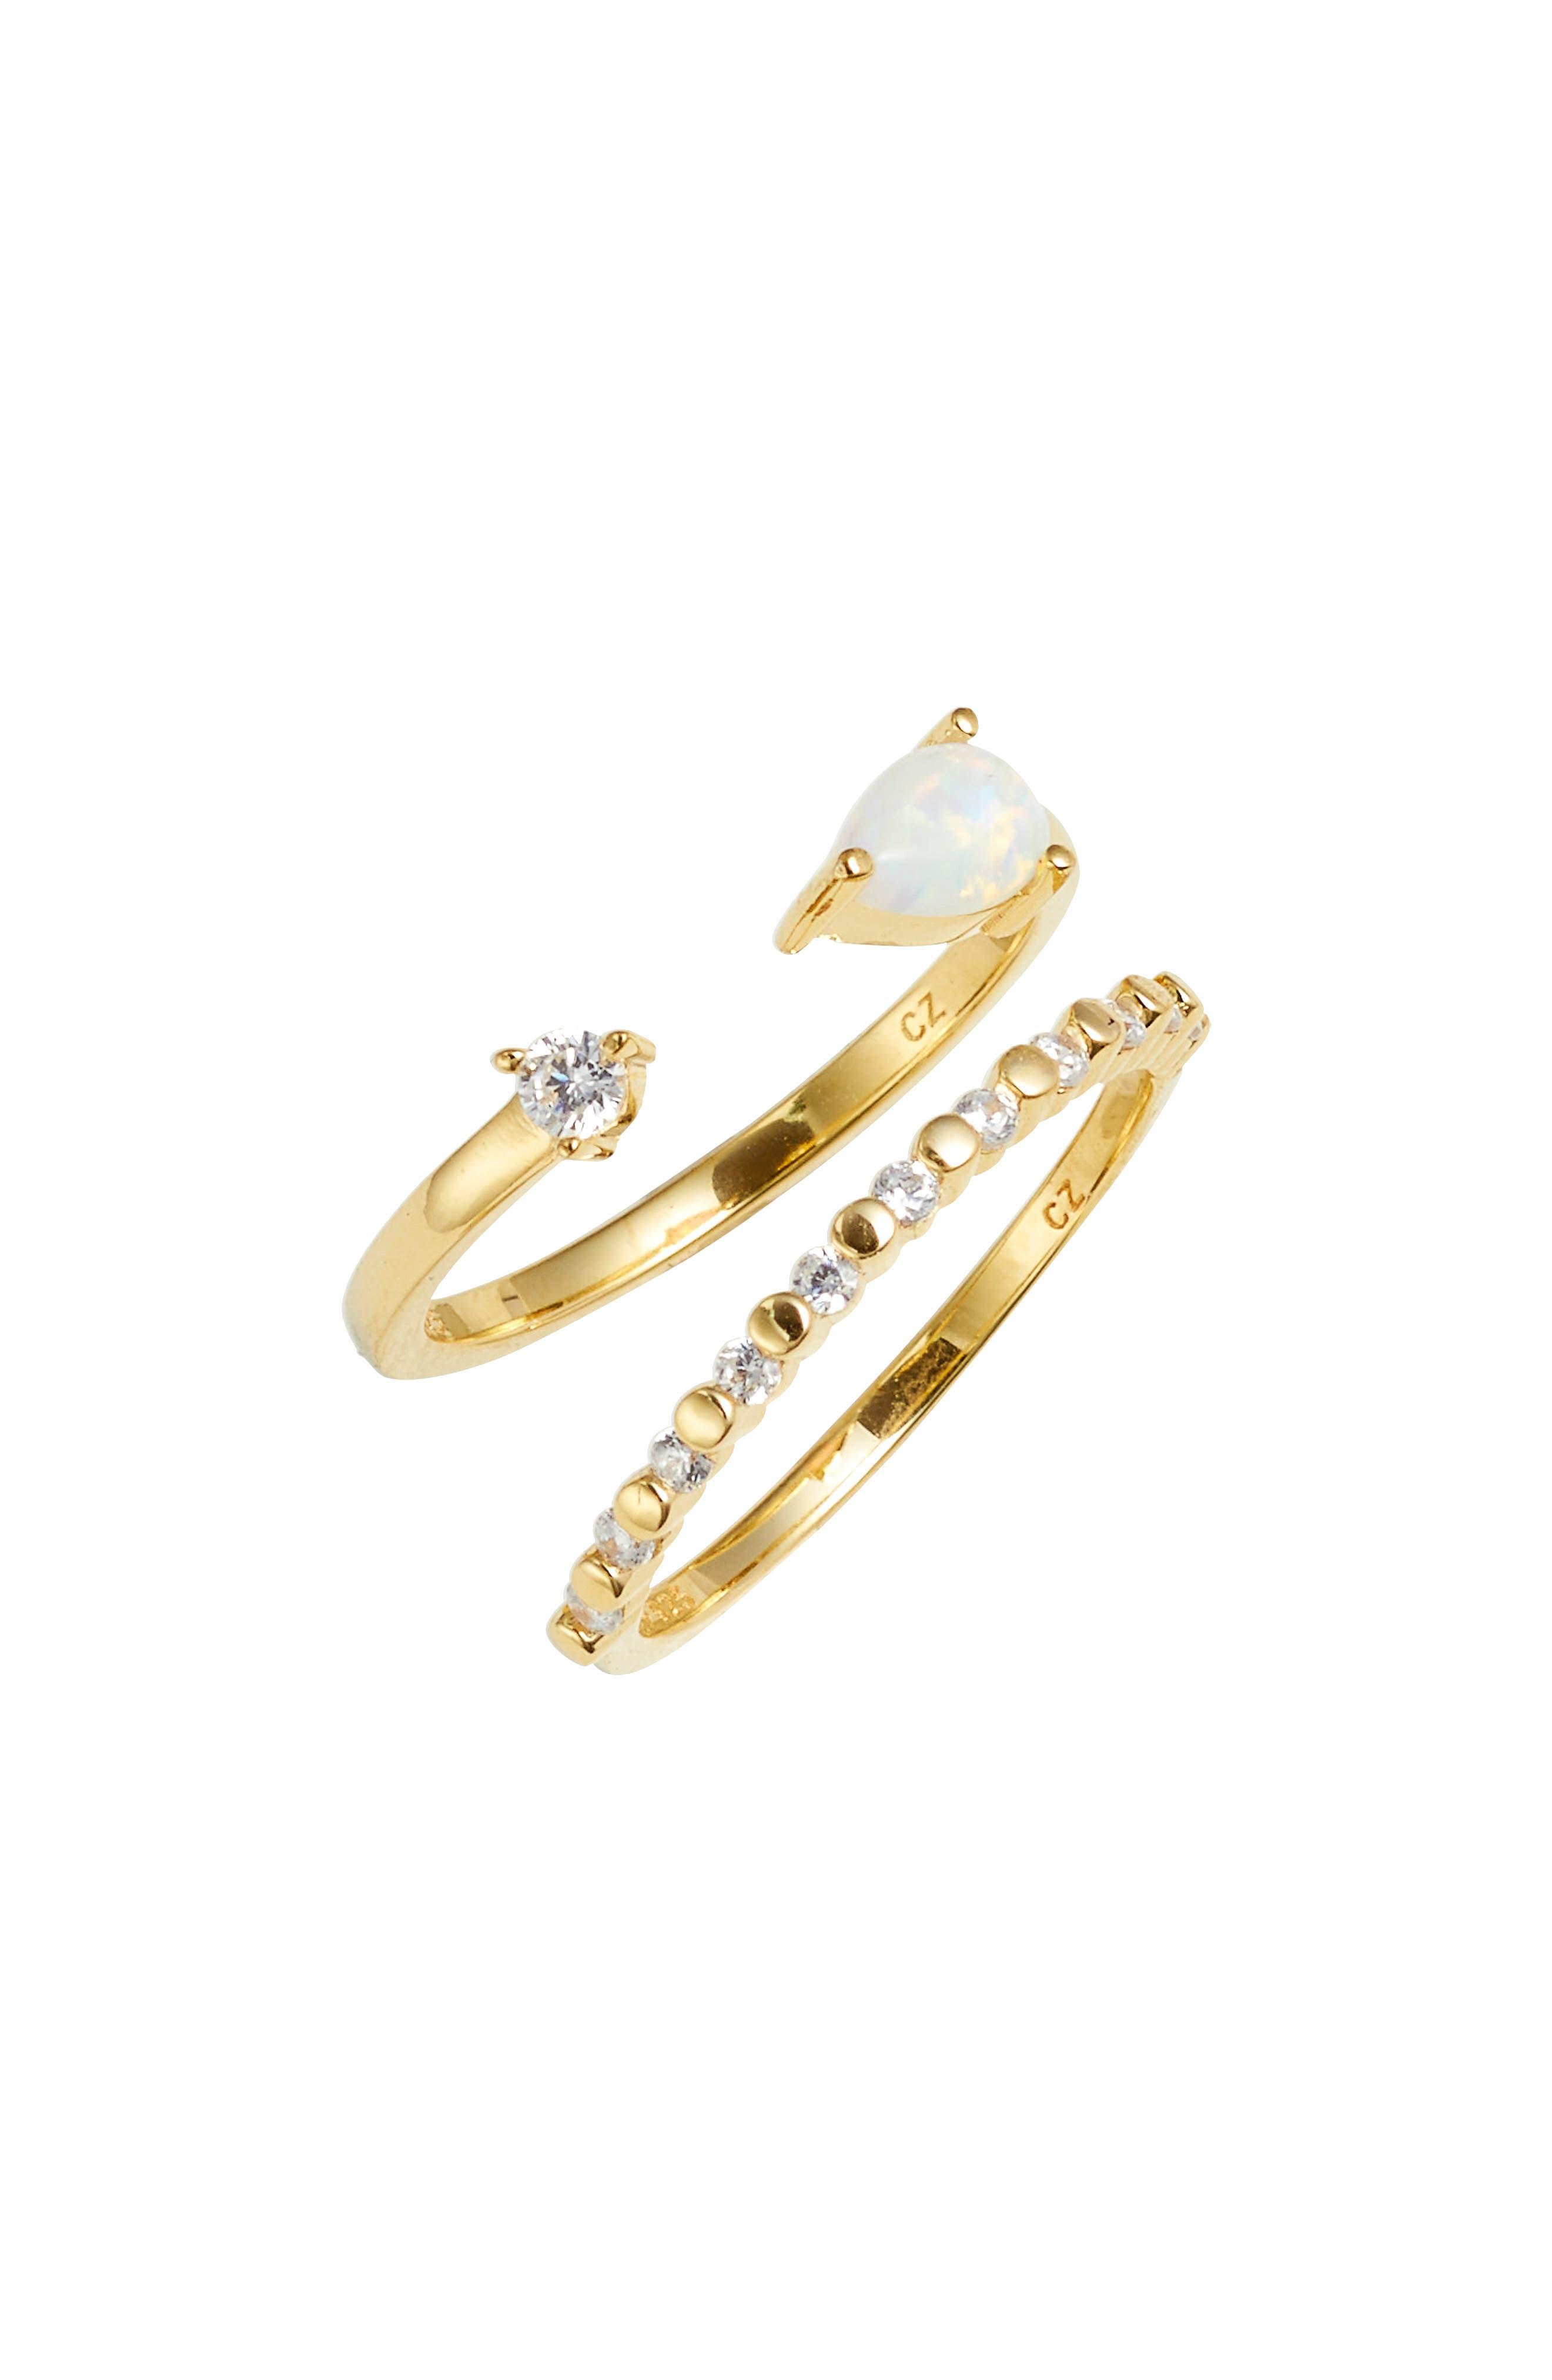 Set of 2 Opal Cuff Rings,                             Main thumbnail 1, color,                             Gold